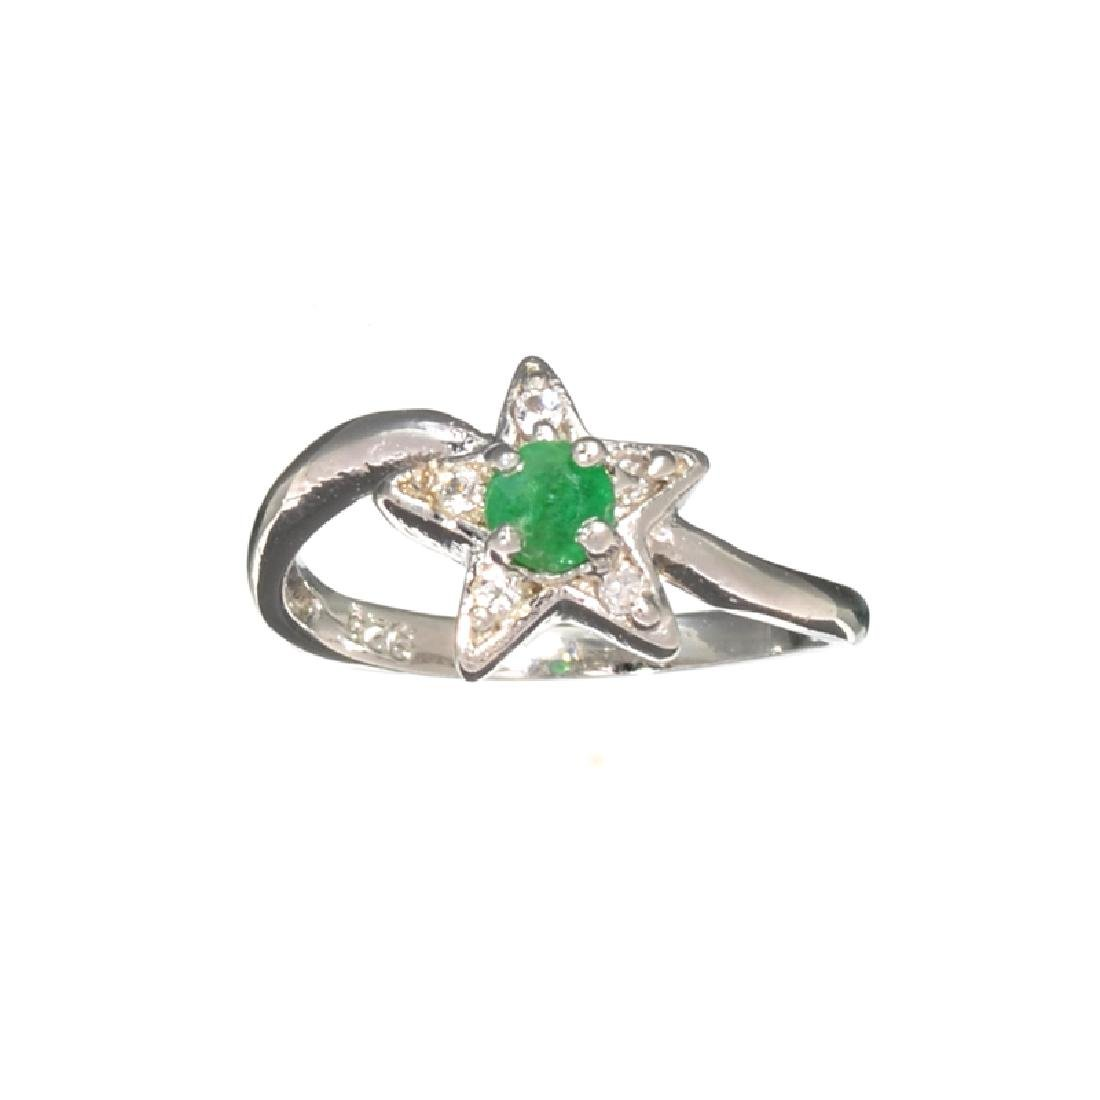 APP: 0.4k Fine Jewelry 0.31CT Green Emerald And White